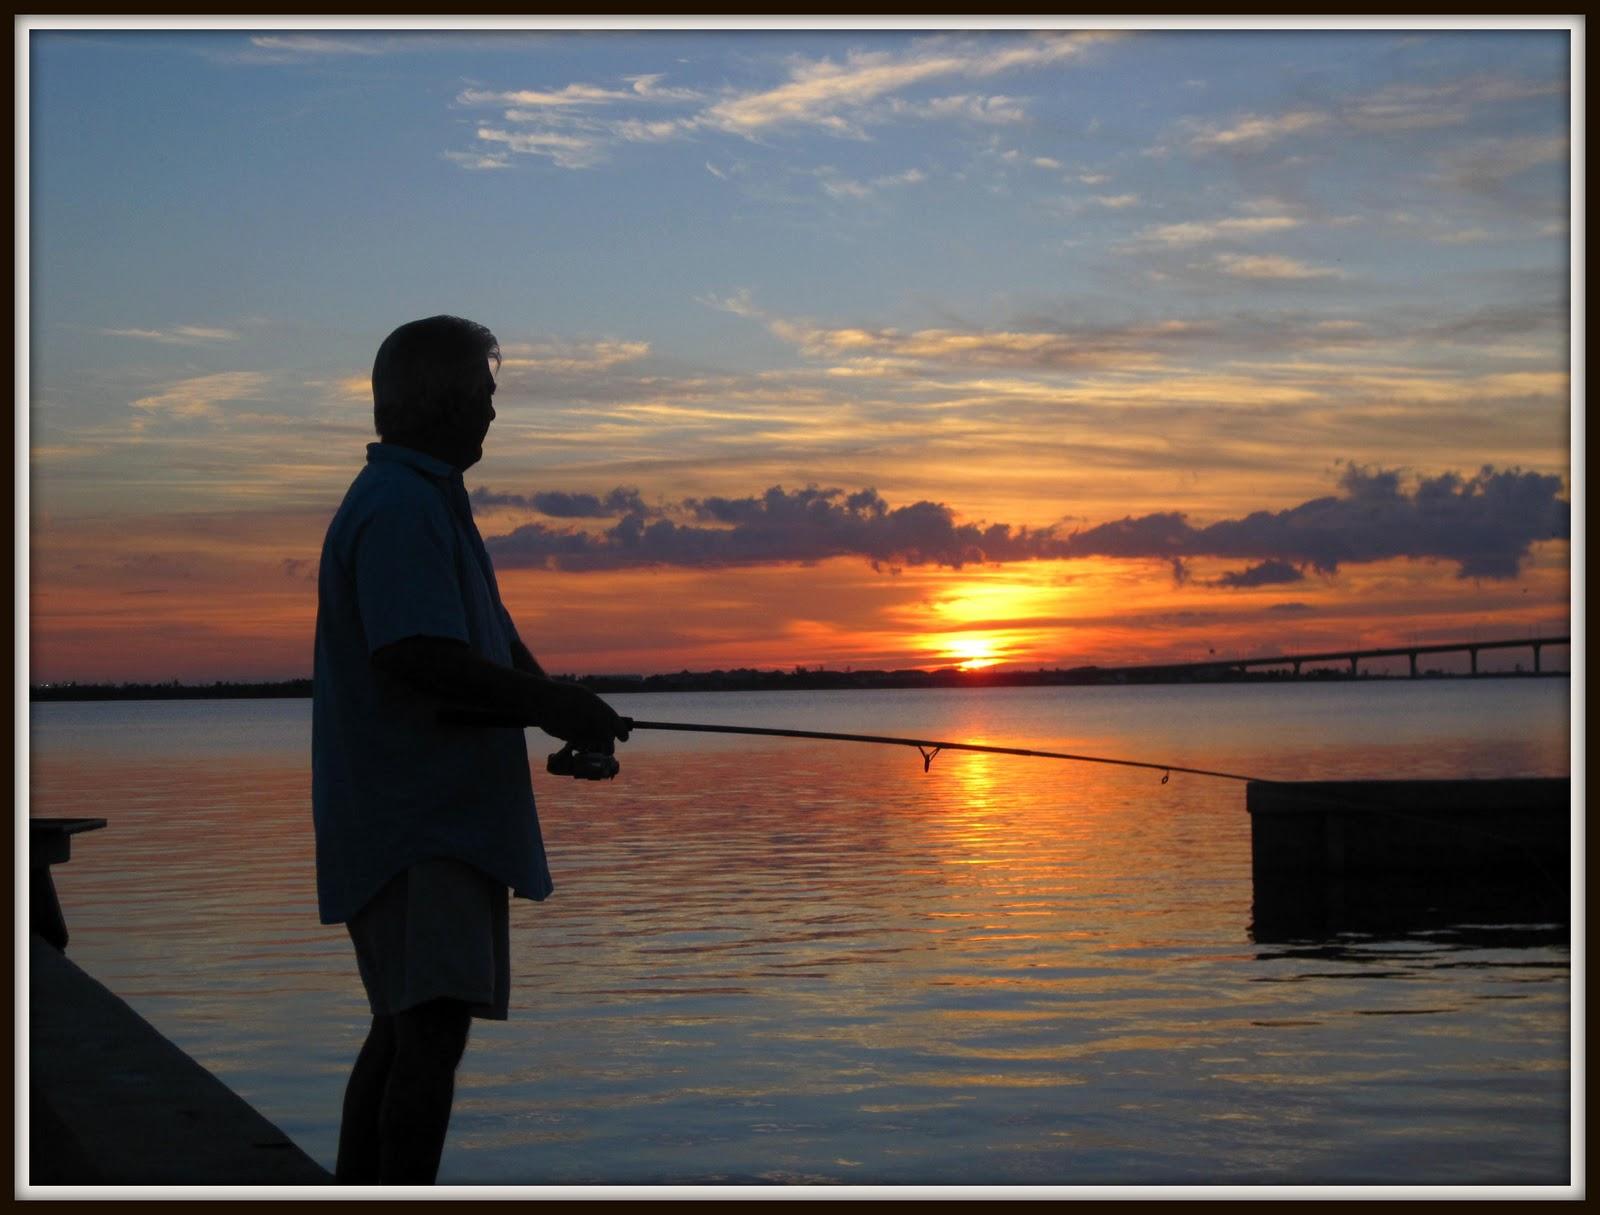 http://1.bp.blogspot.com/_iMzUoe4y8GM/TMhvU6R1I7I/AAAAAAAACco/j8vSt9dAvqA/s1600/Jim%252Bfishing%252Bwith%252Bsunrise.jpg